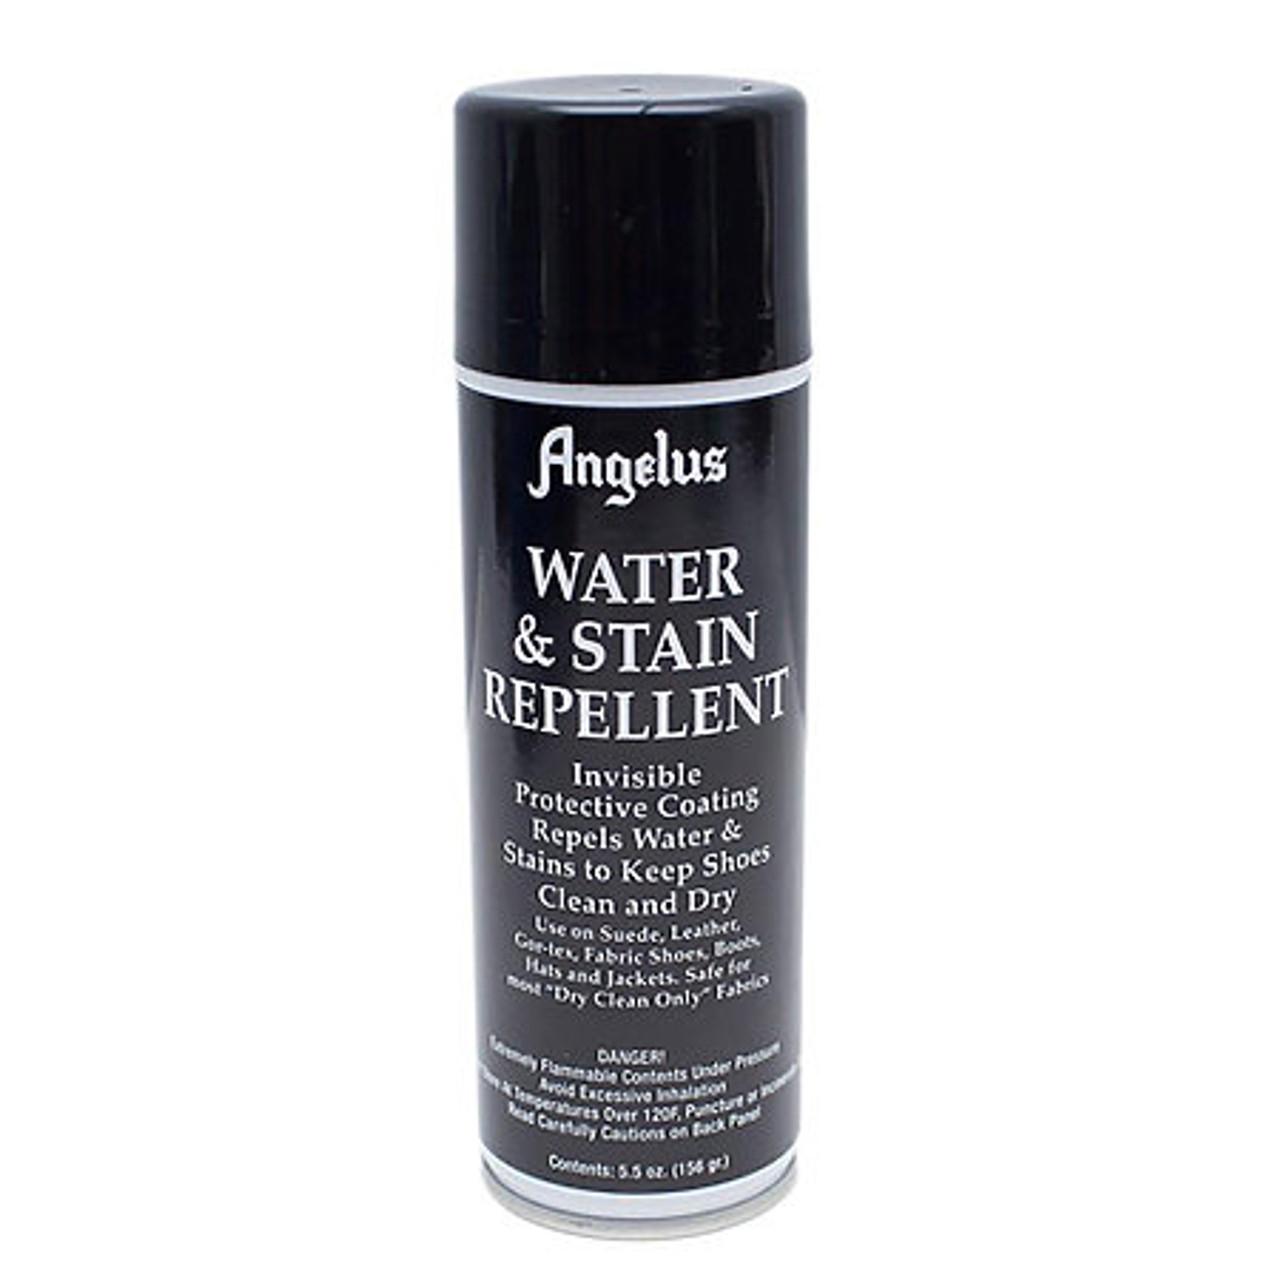 Angelus Water & Stain Repellant